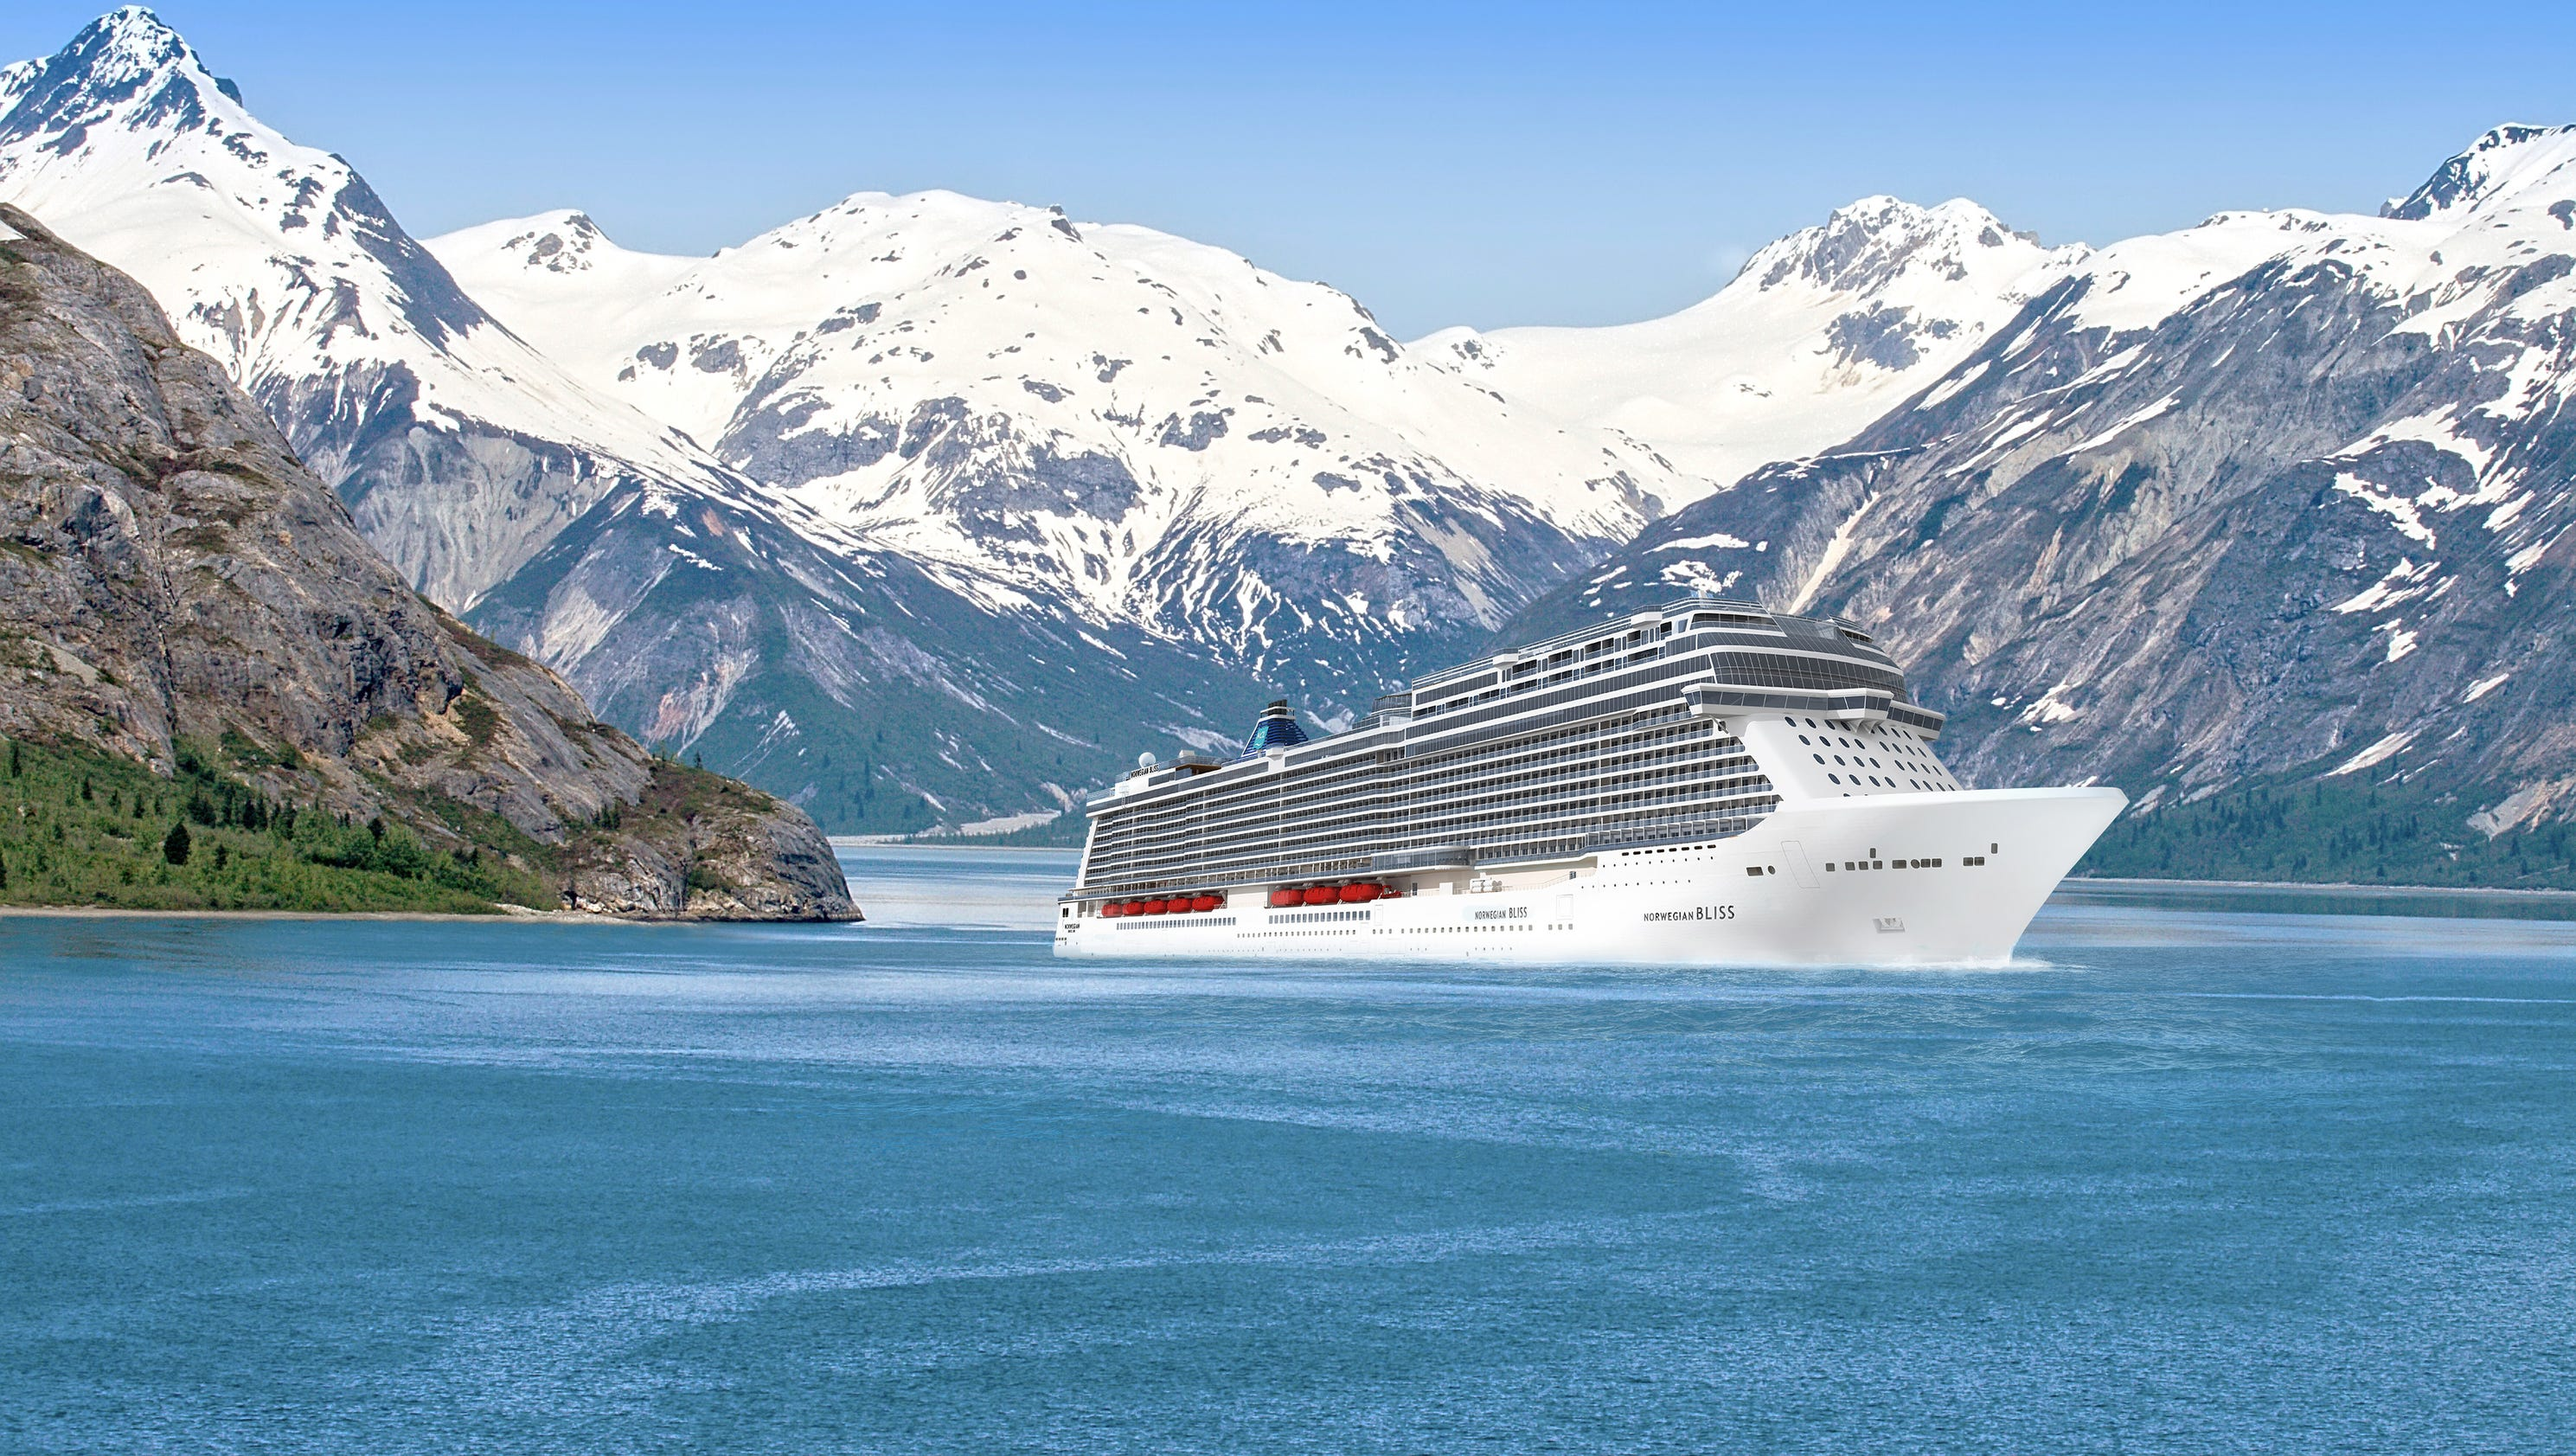 Giant new Norwegian Cruise Line ship is headed to Alaska